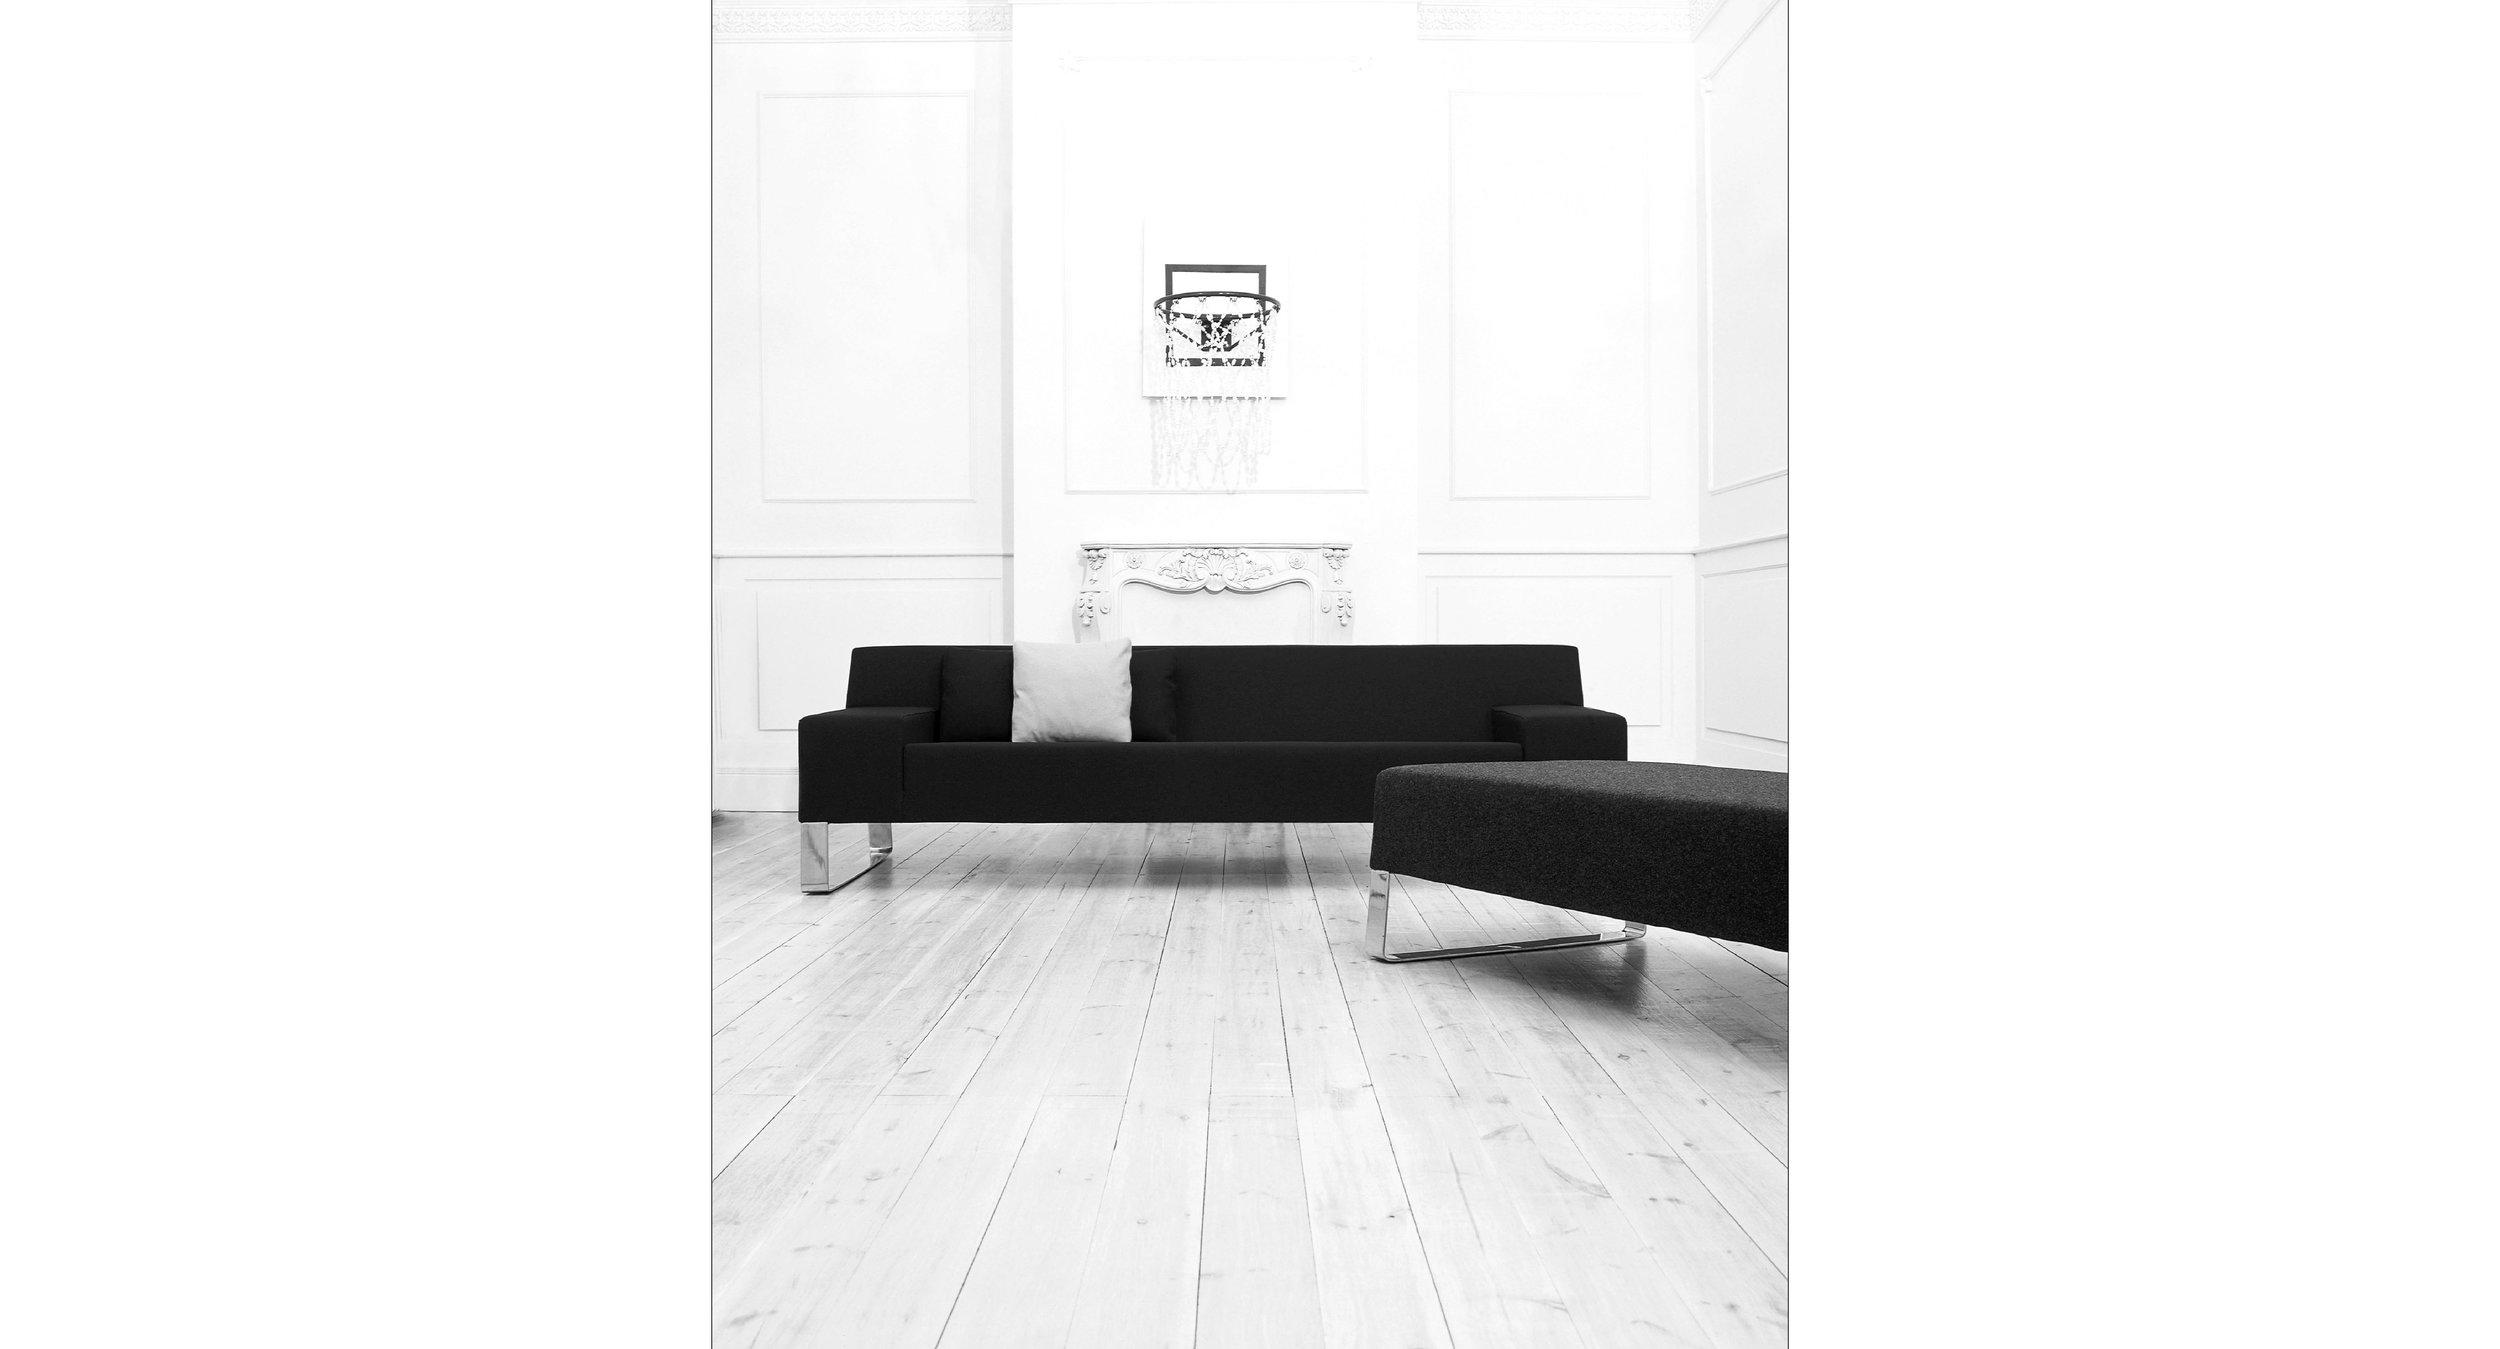 Sanctus Sofa collection